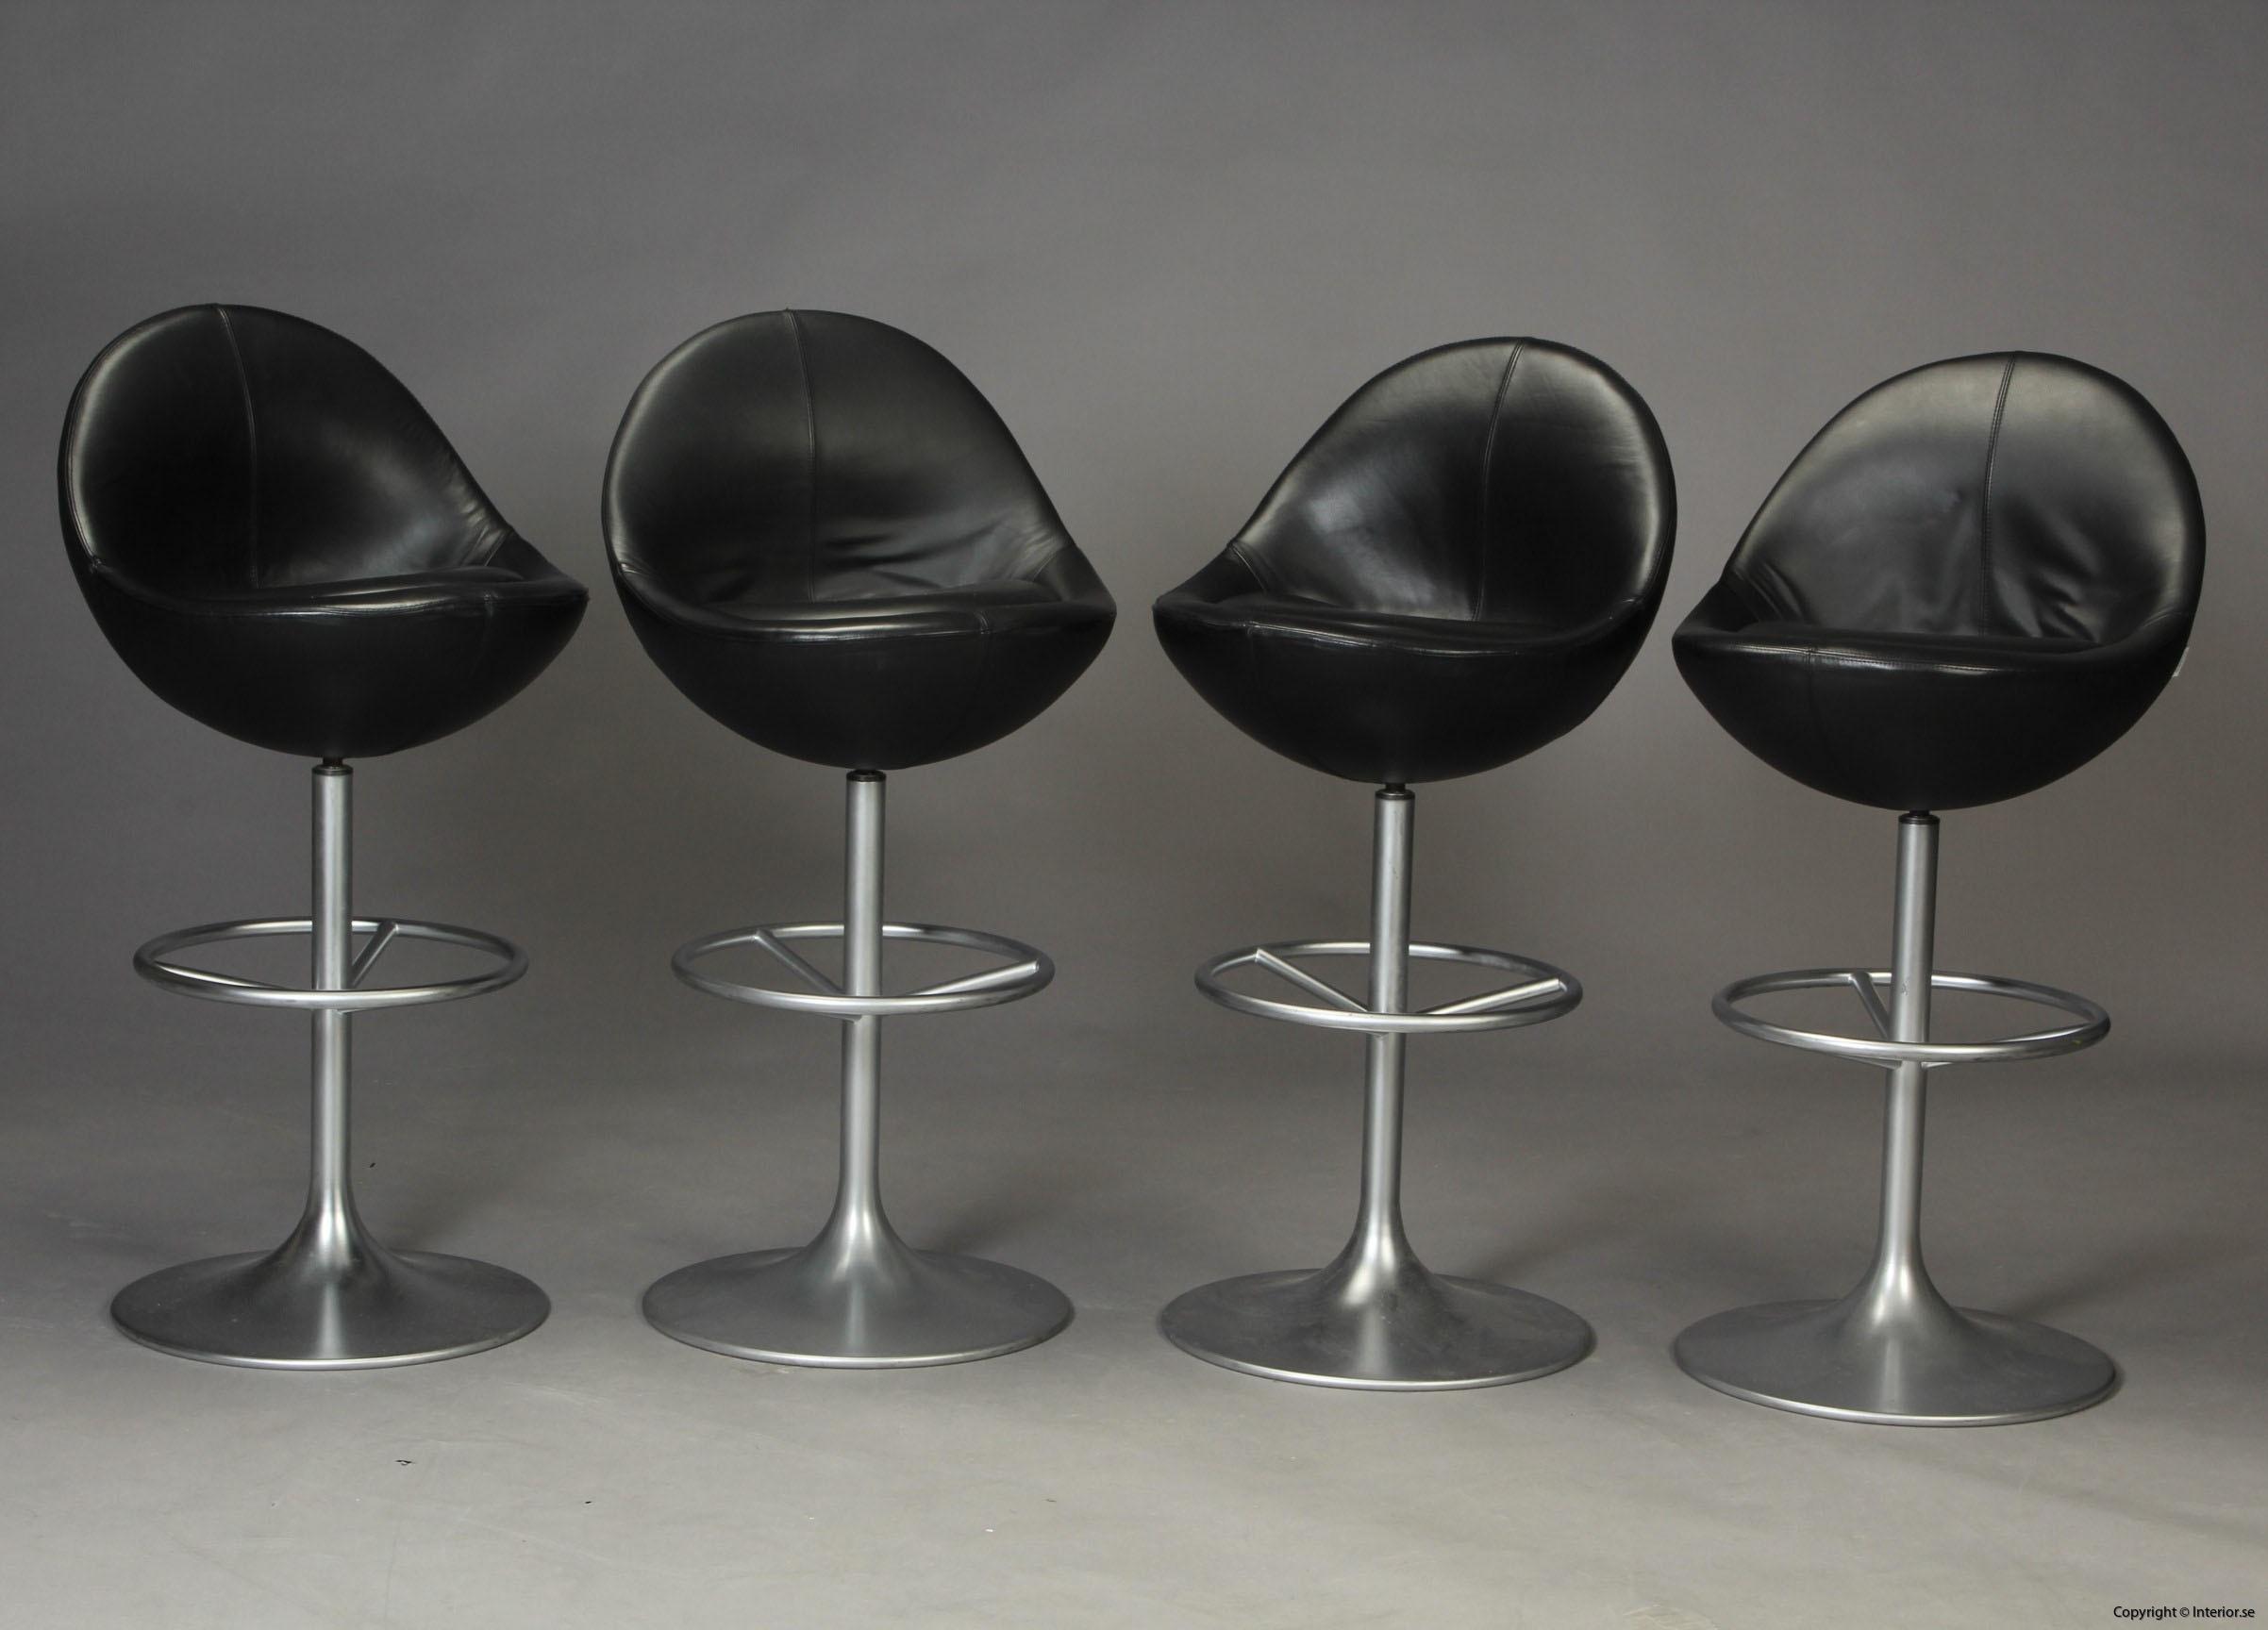 1 Johanson Design venus barstol